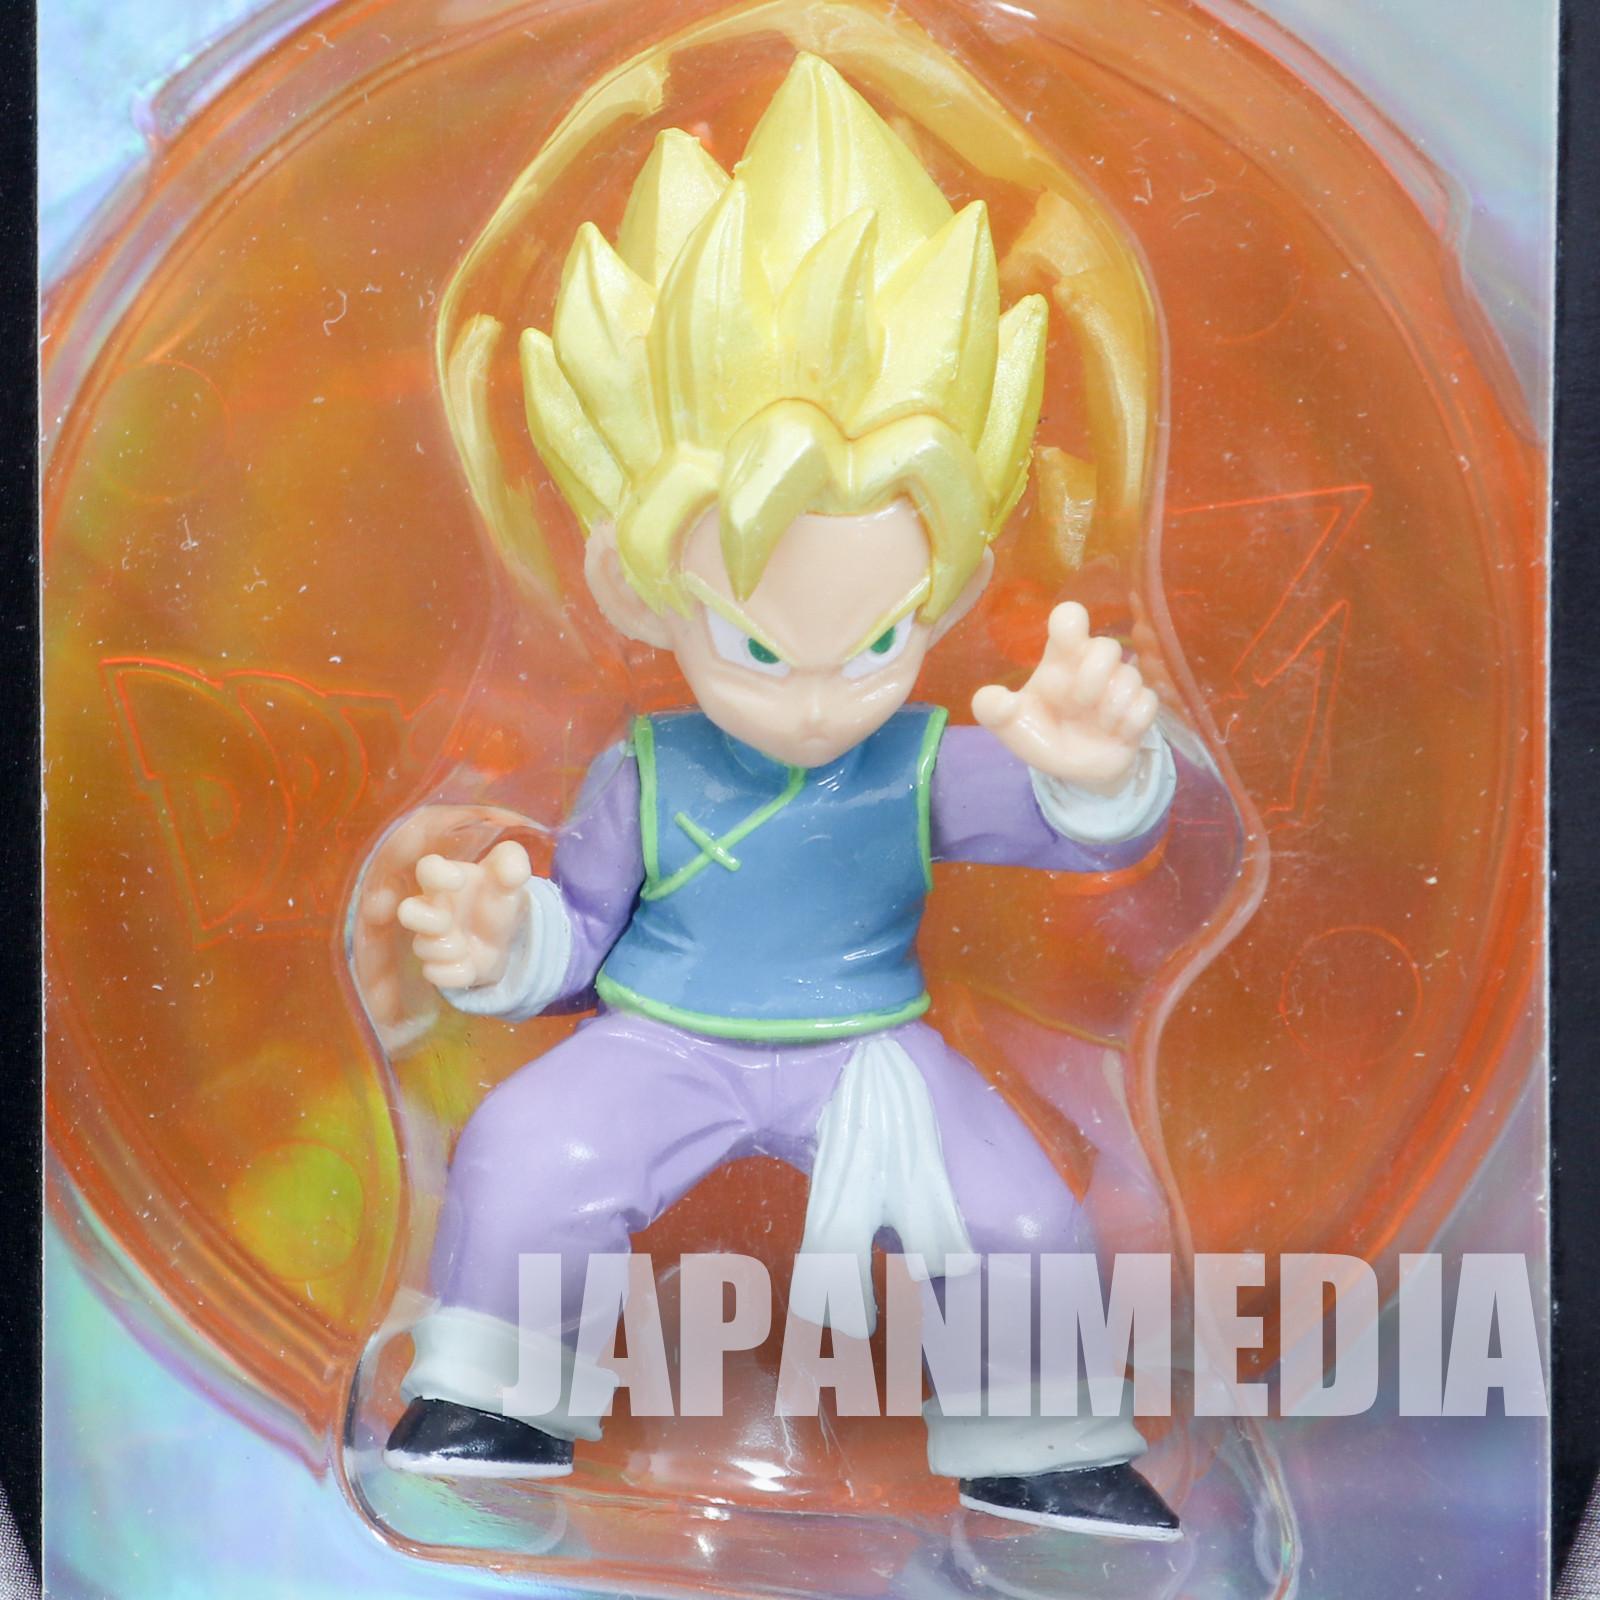 Dragon Ball Z Super Saiyan Goten Figure  Banpresto JAPAN ANIME MANGA